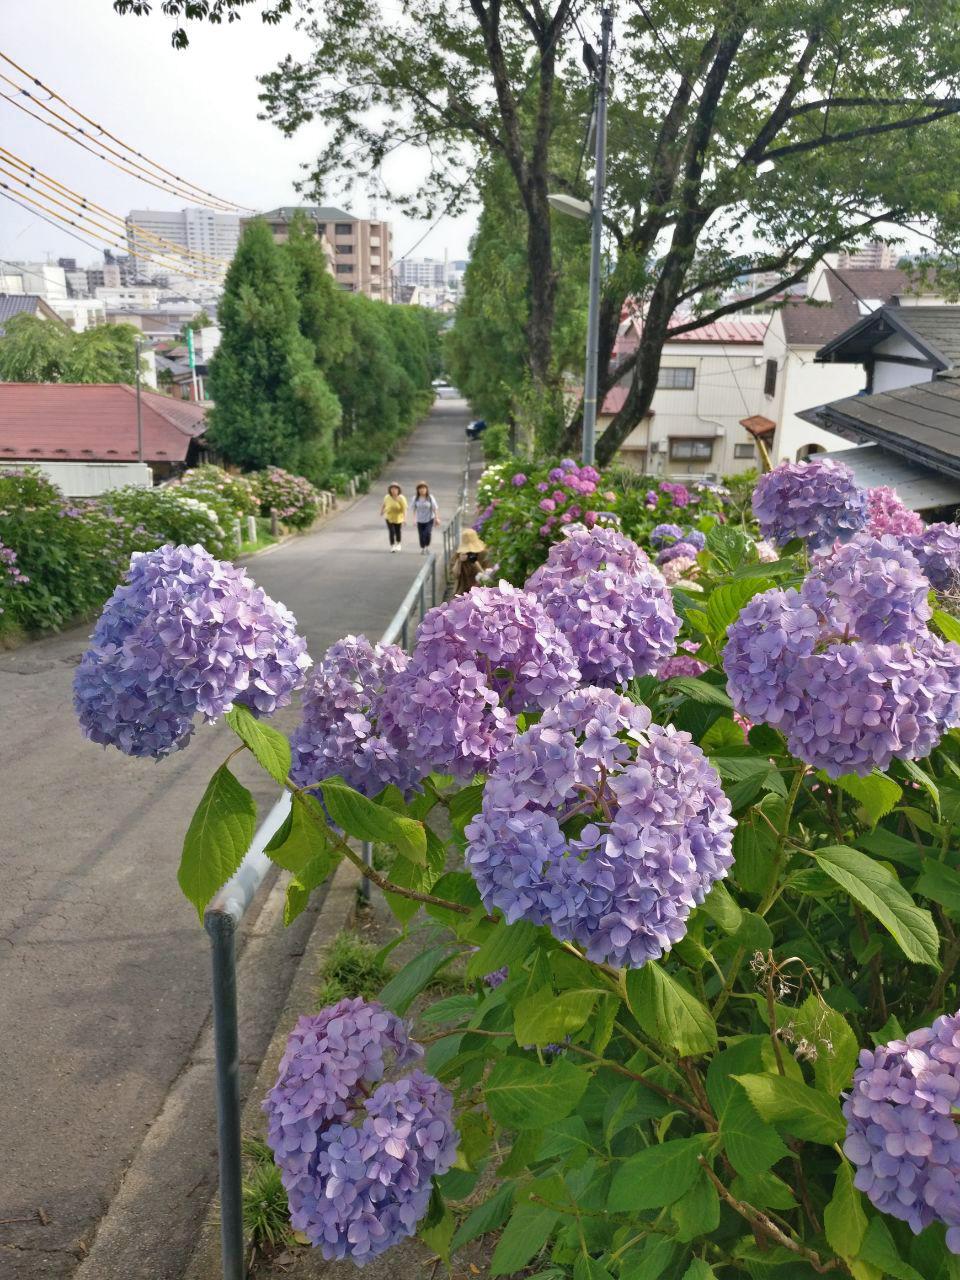 photo_2019-08-02_16-49-33.jpg